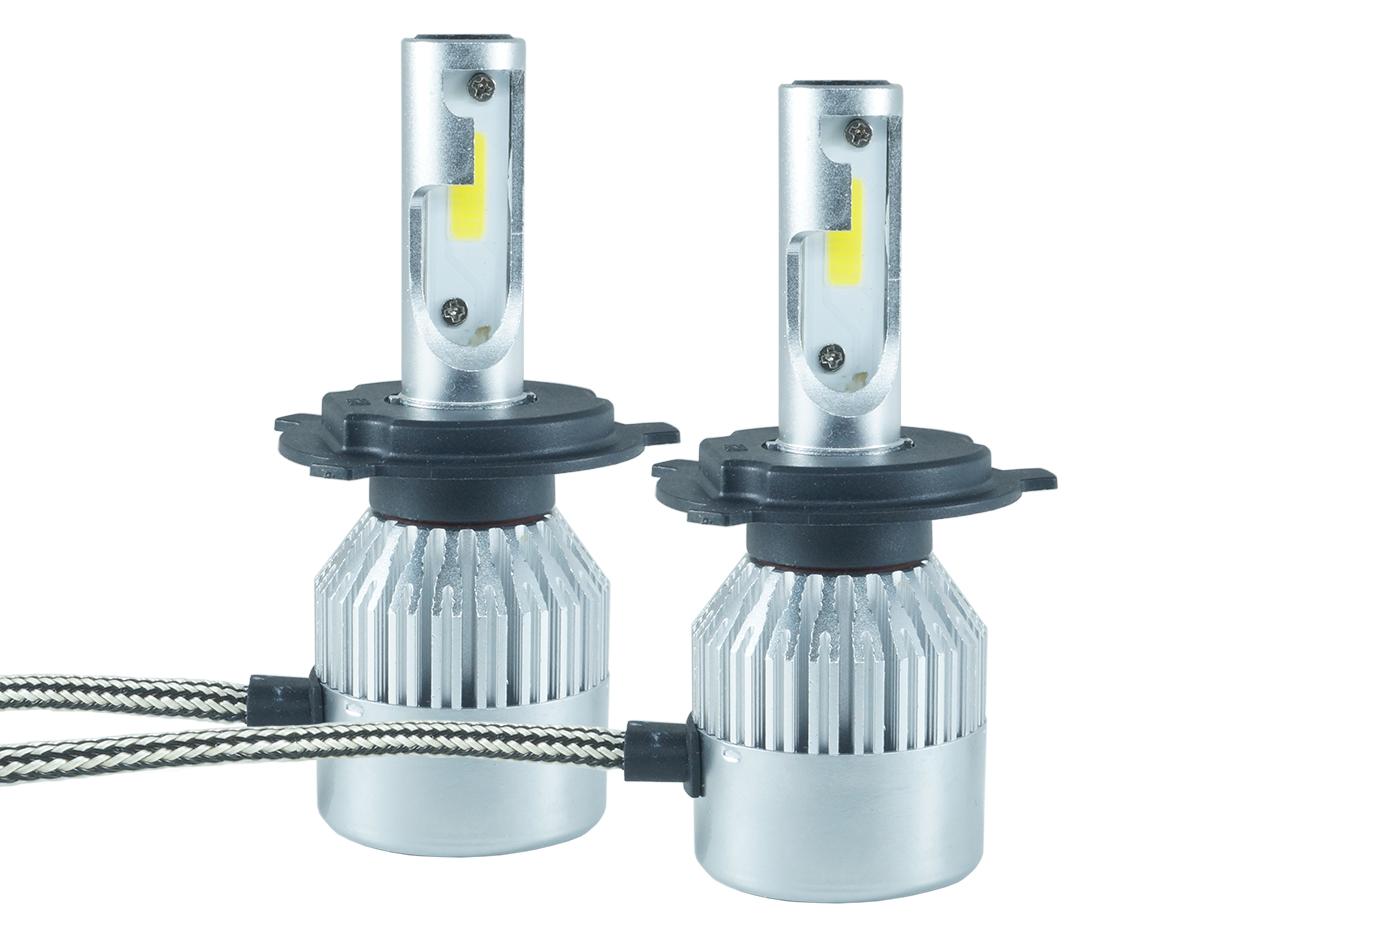 Kit coppia lampadine h4 t6 lampade led fari luci auto for Lampadine led per auto